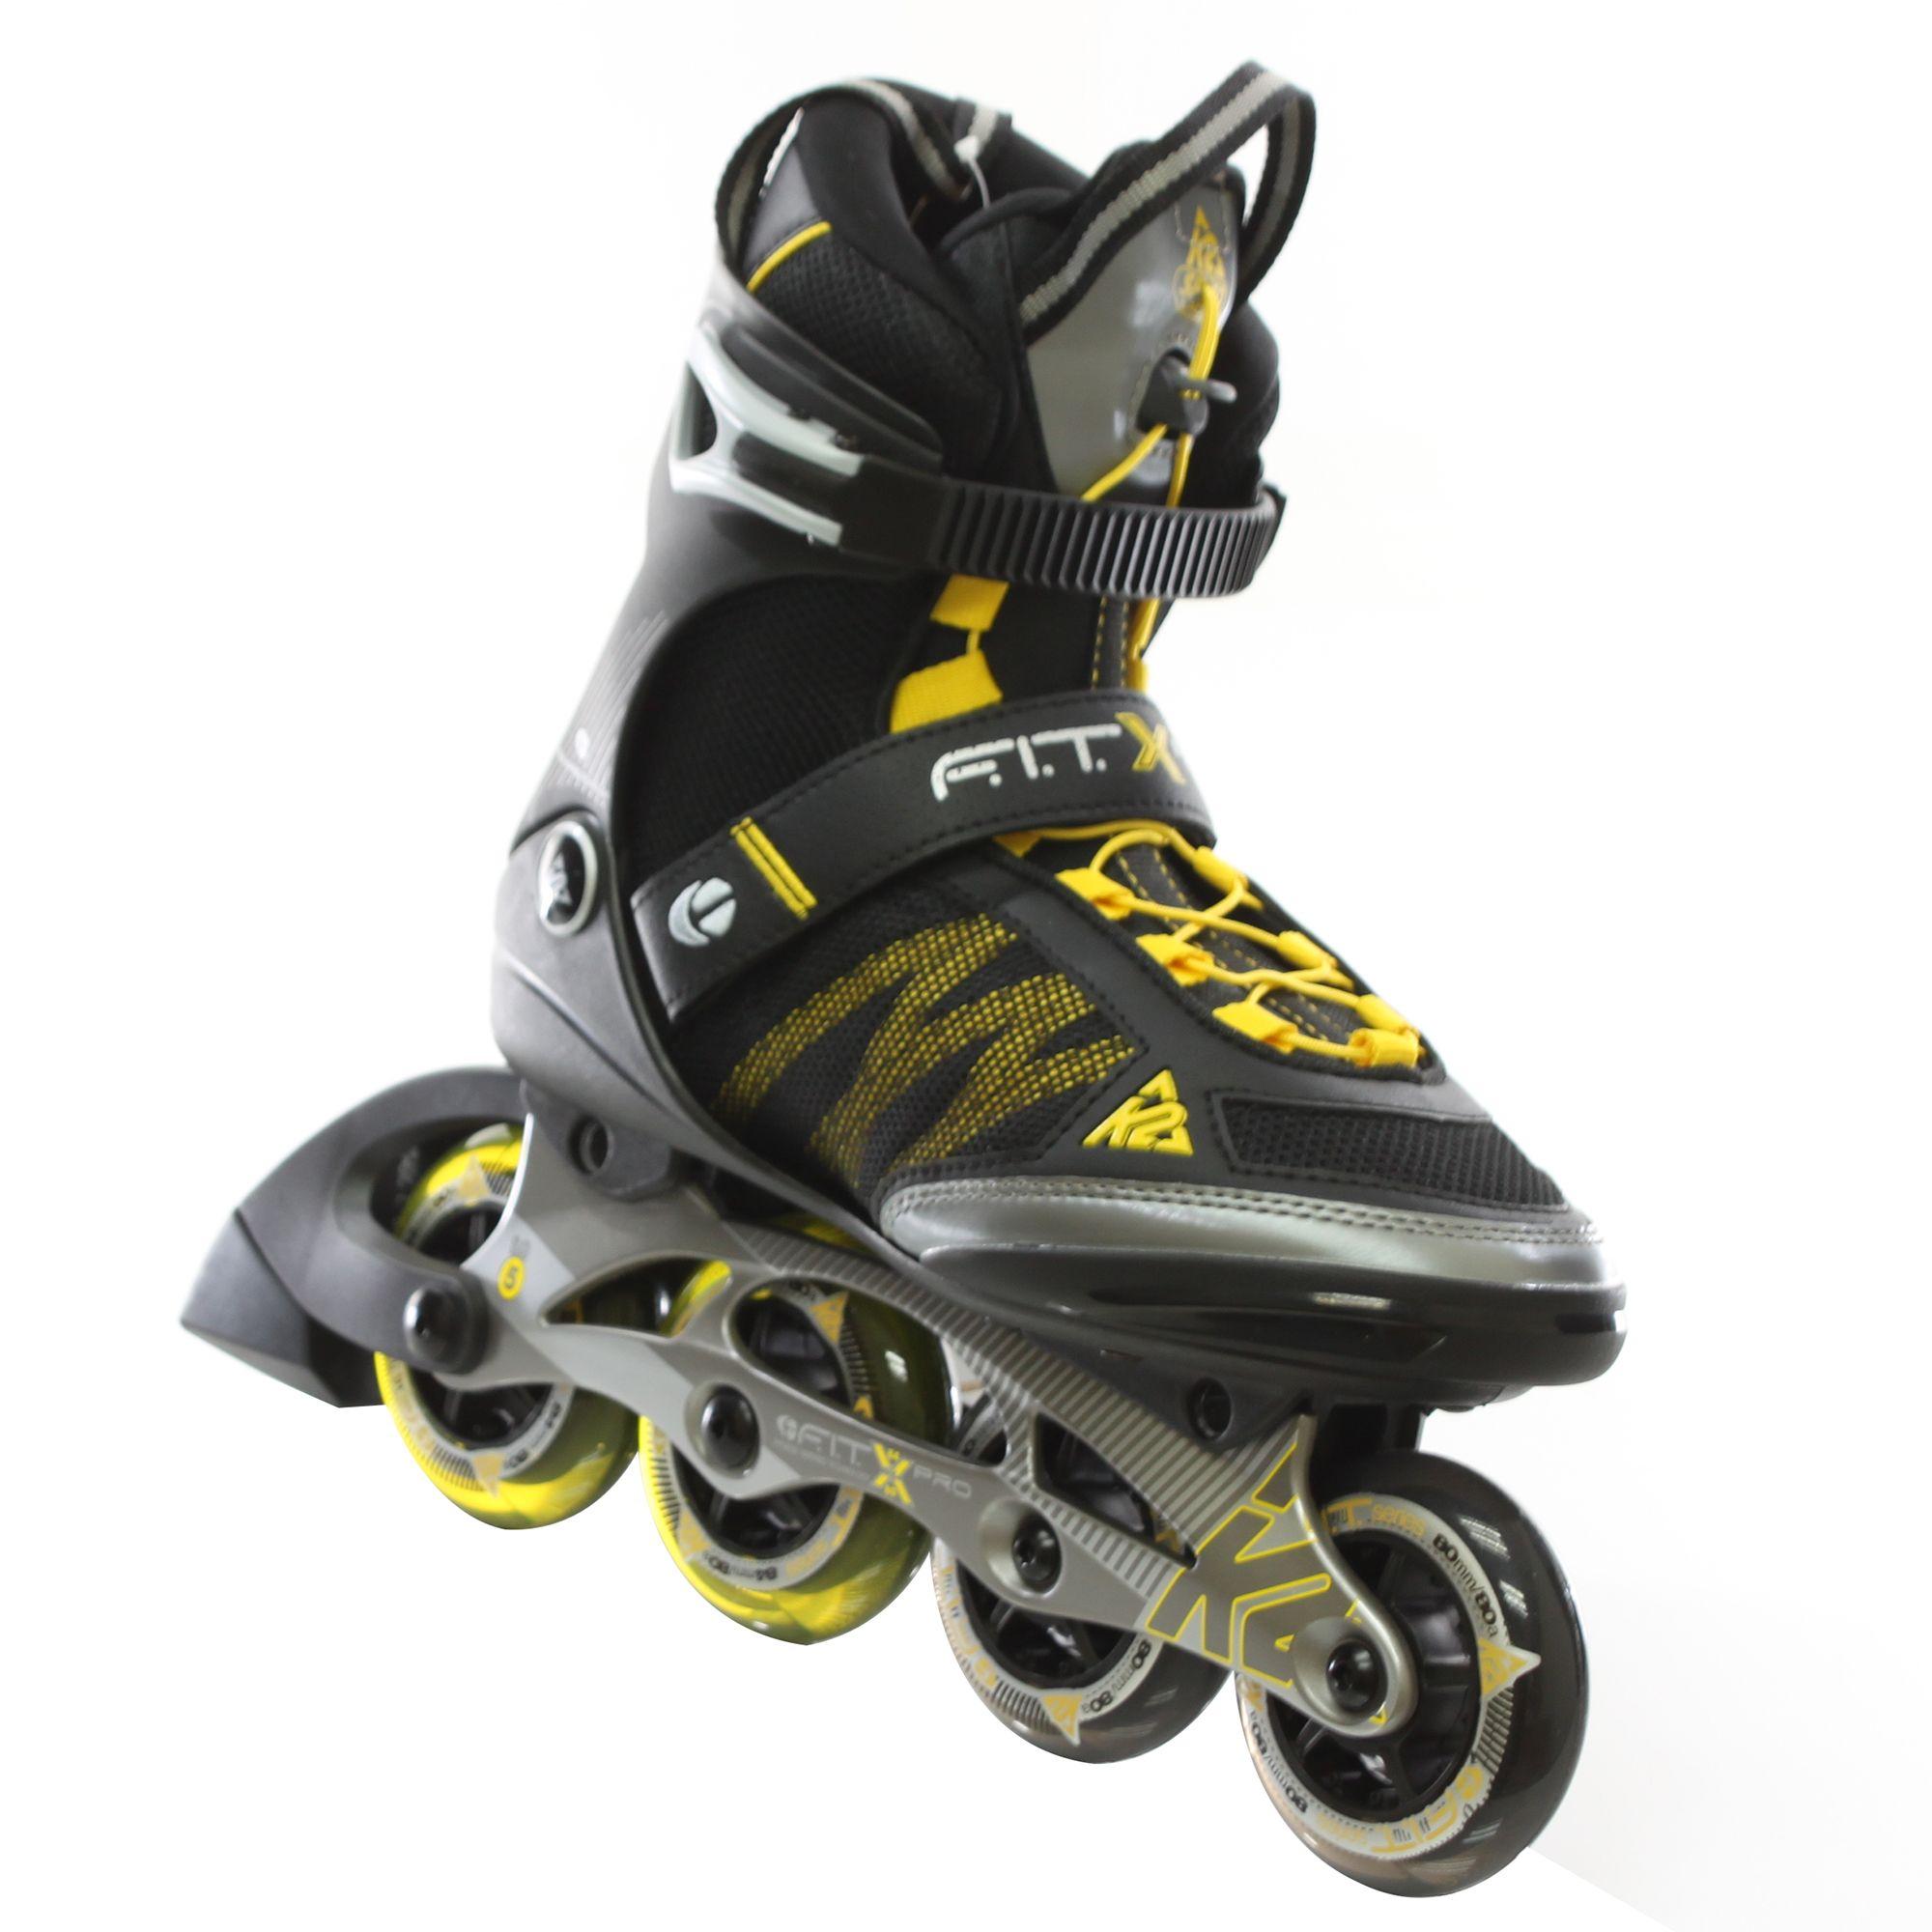 Skateline Malaysia Speed laces, Sport shoes, Gunmetal